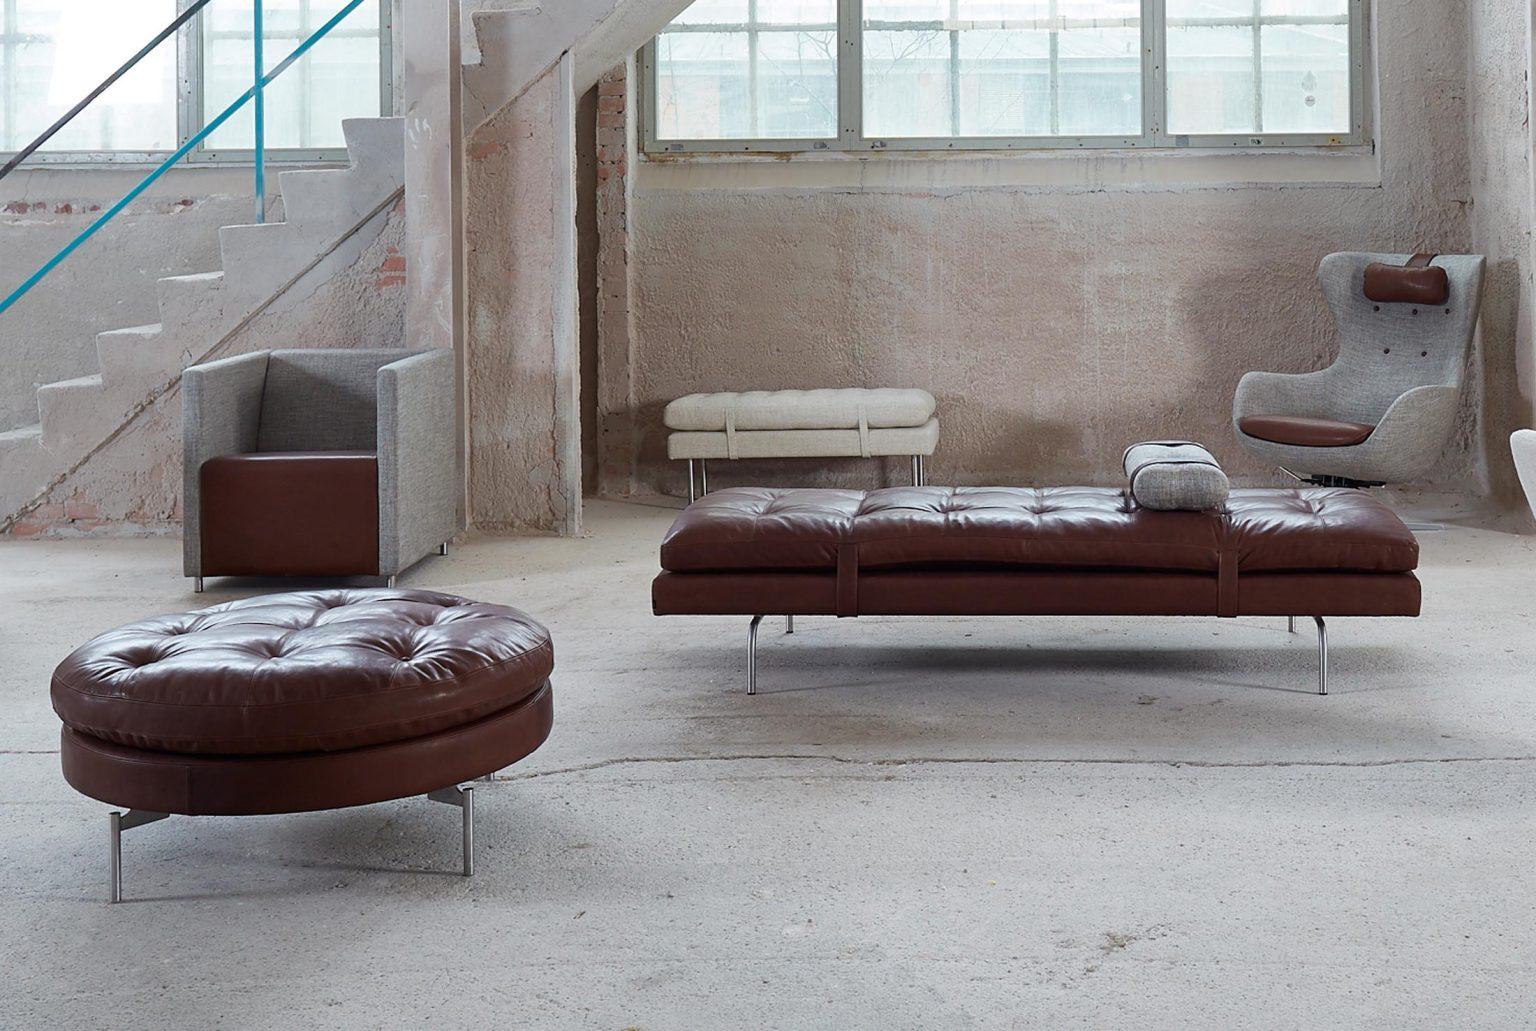 Biennale Interieur - Belgium's leading design and interior event - Daybed-ziro-3.jpg